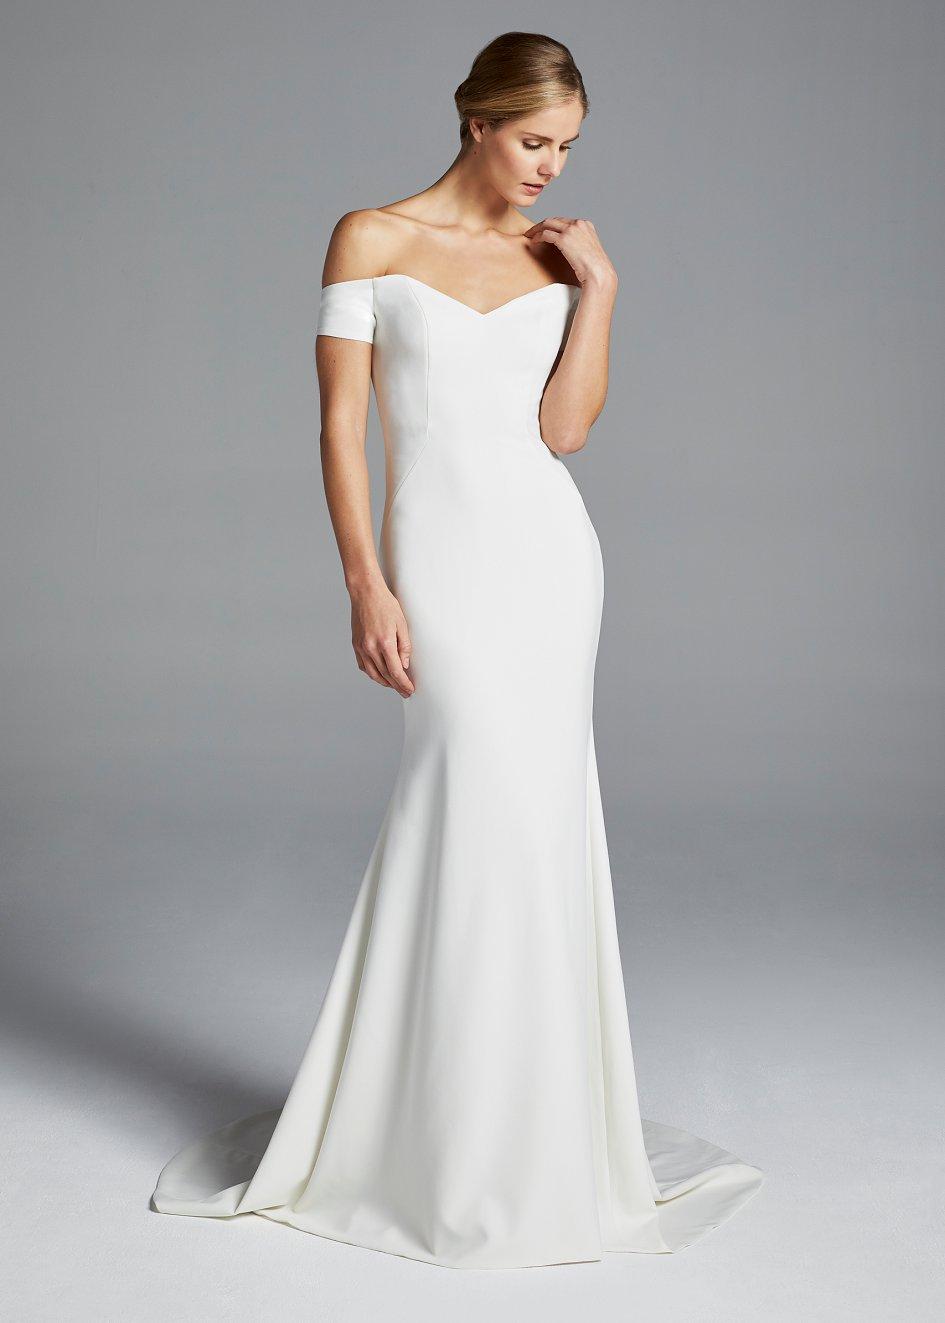 wedding simple dresses photo - 1